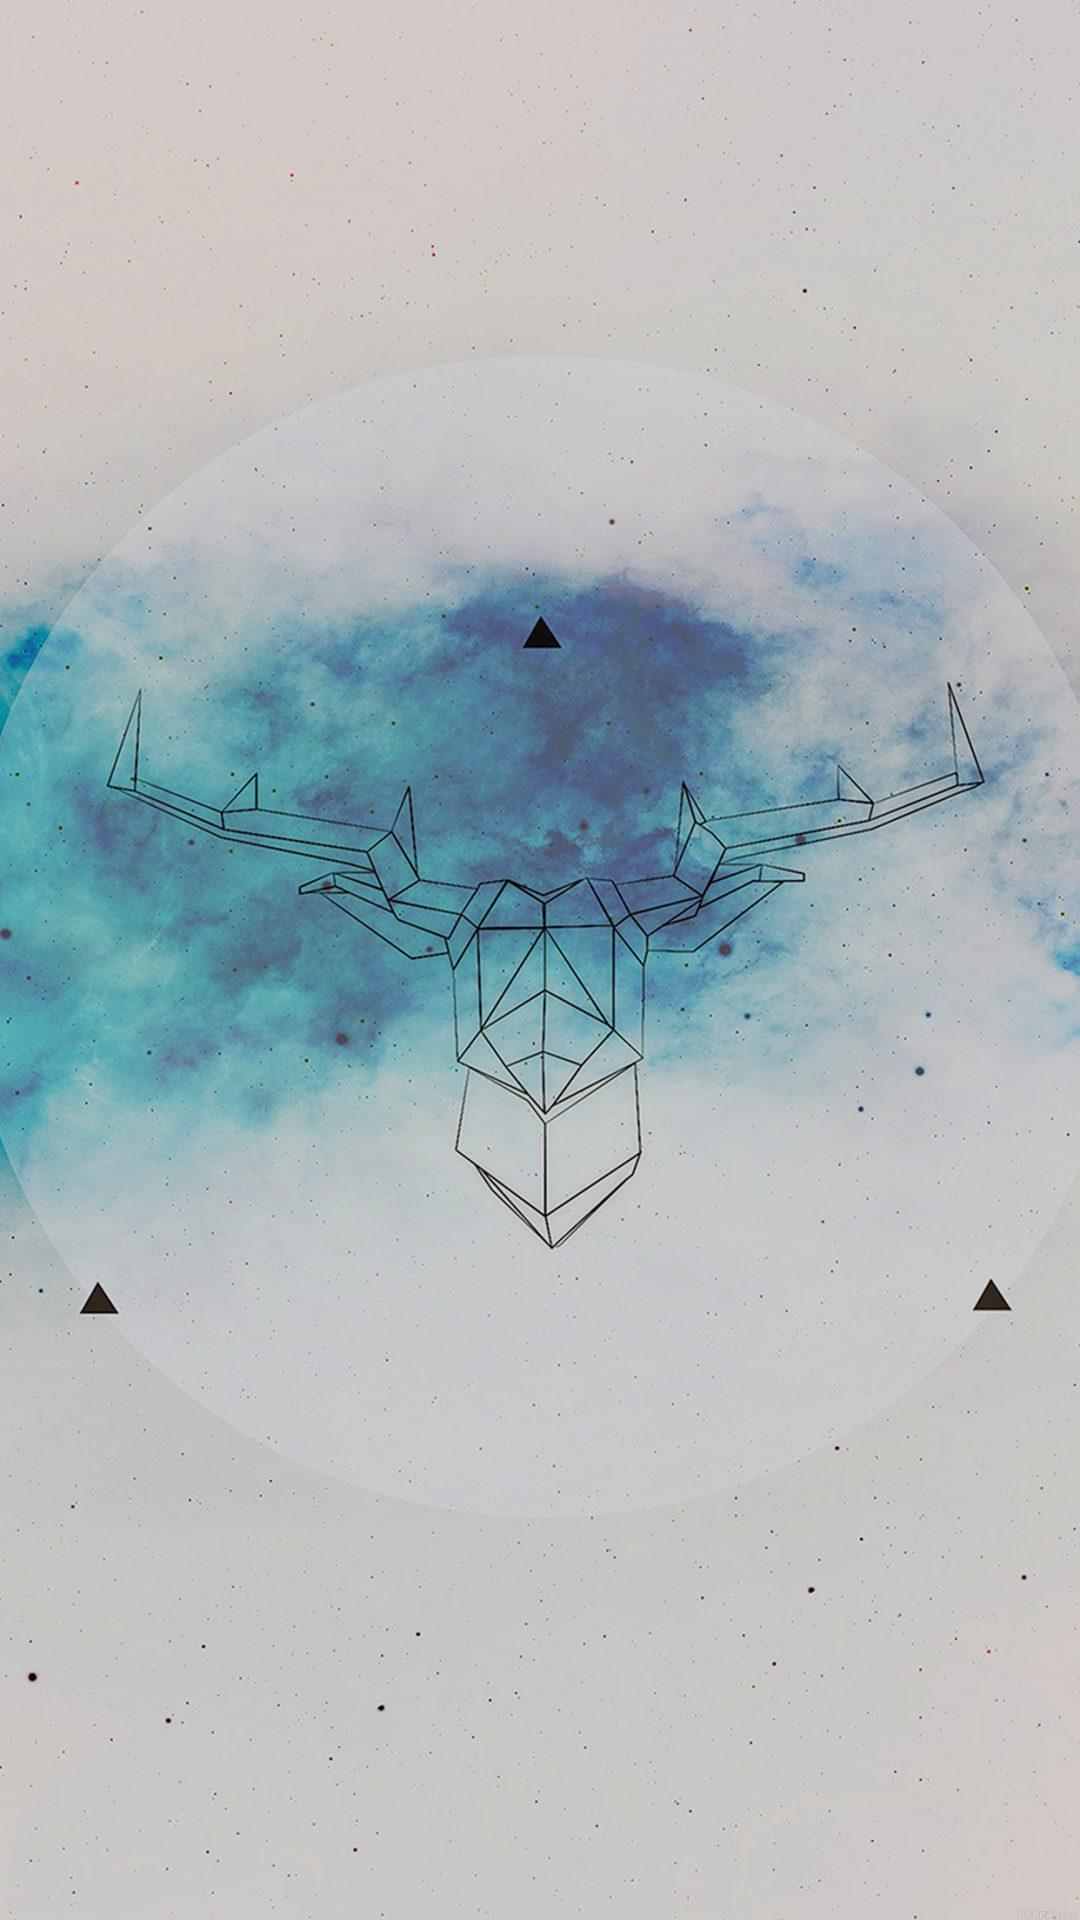 Art Illust Deer Space Cool